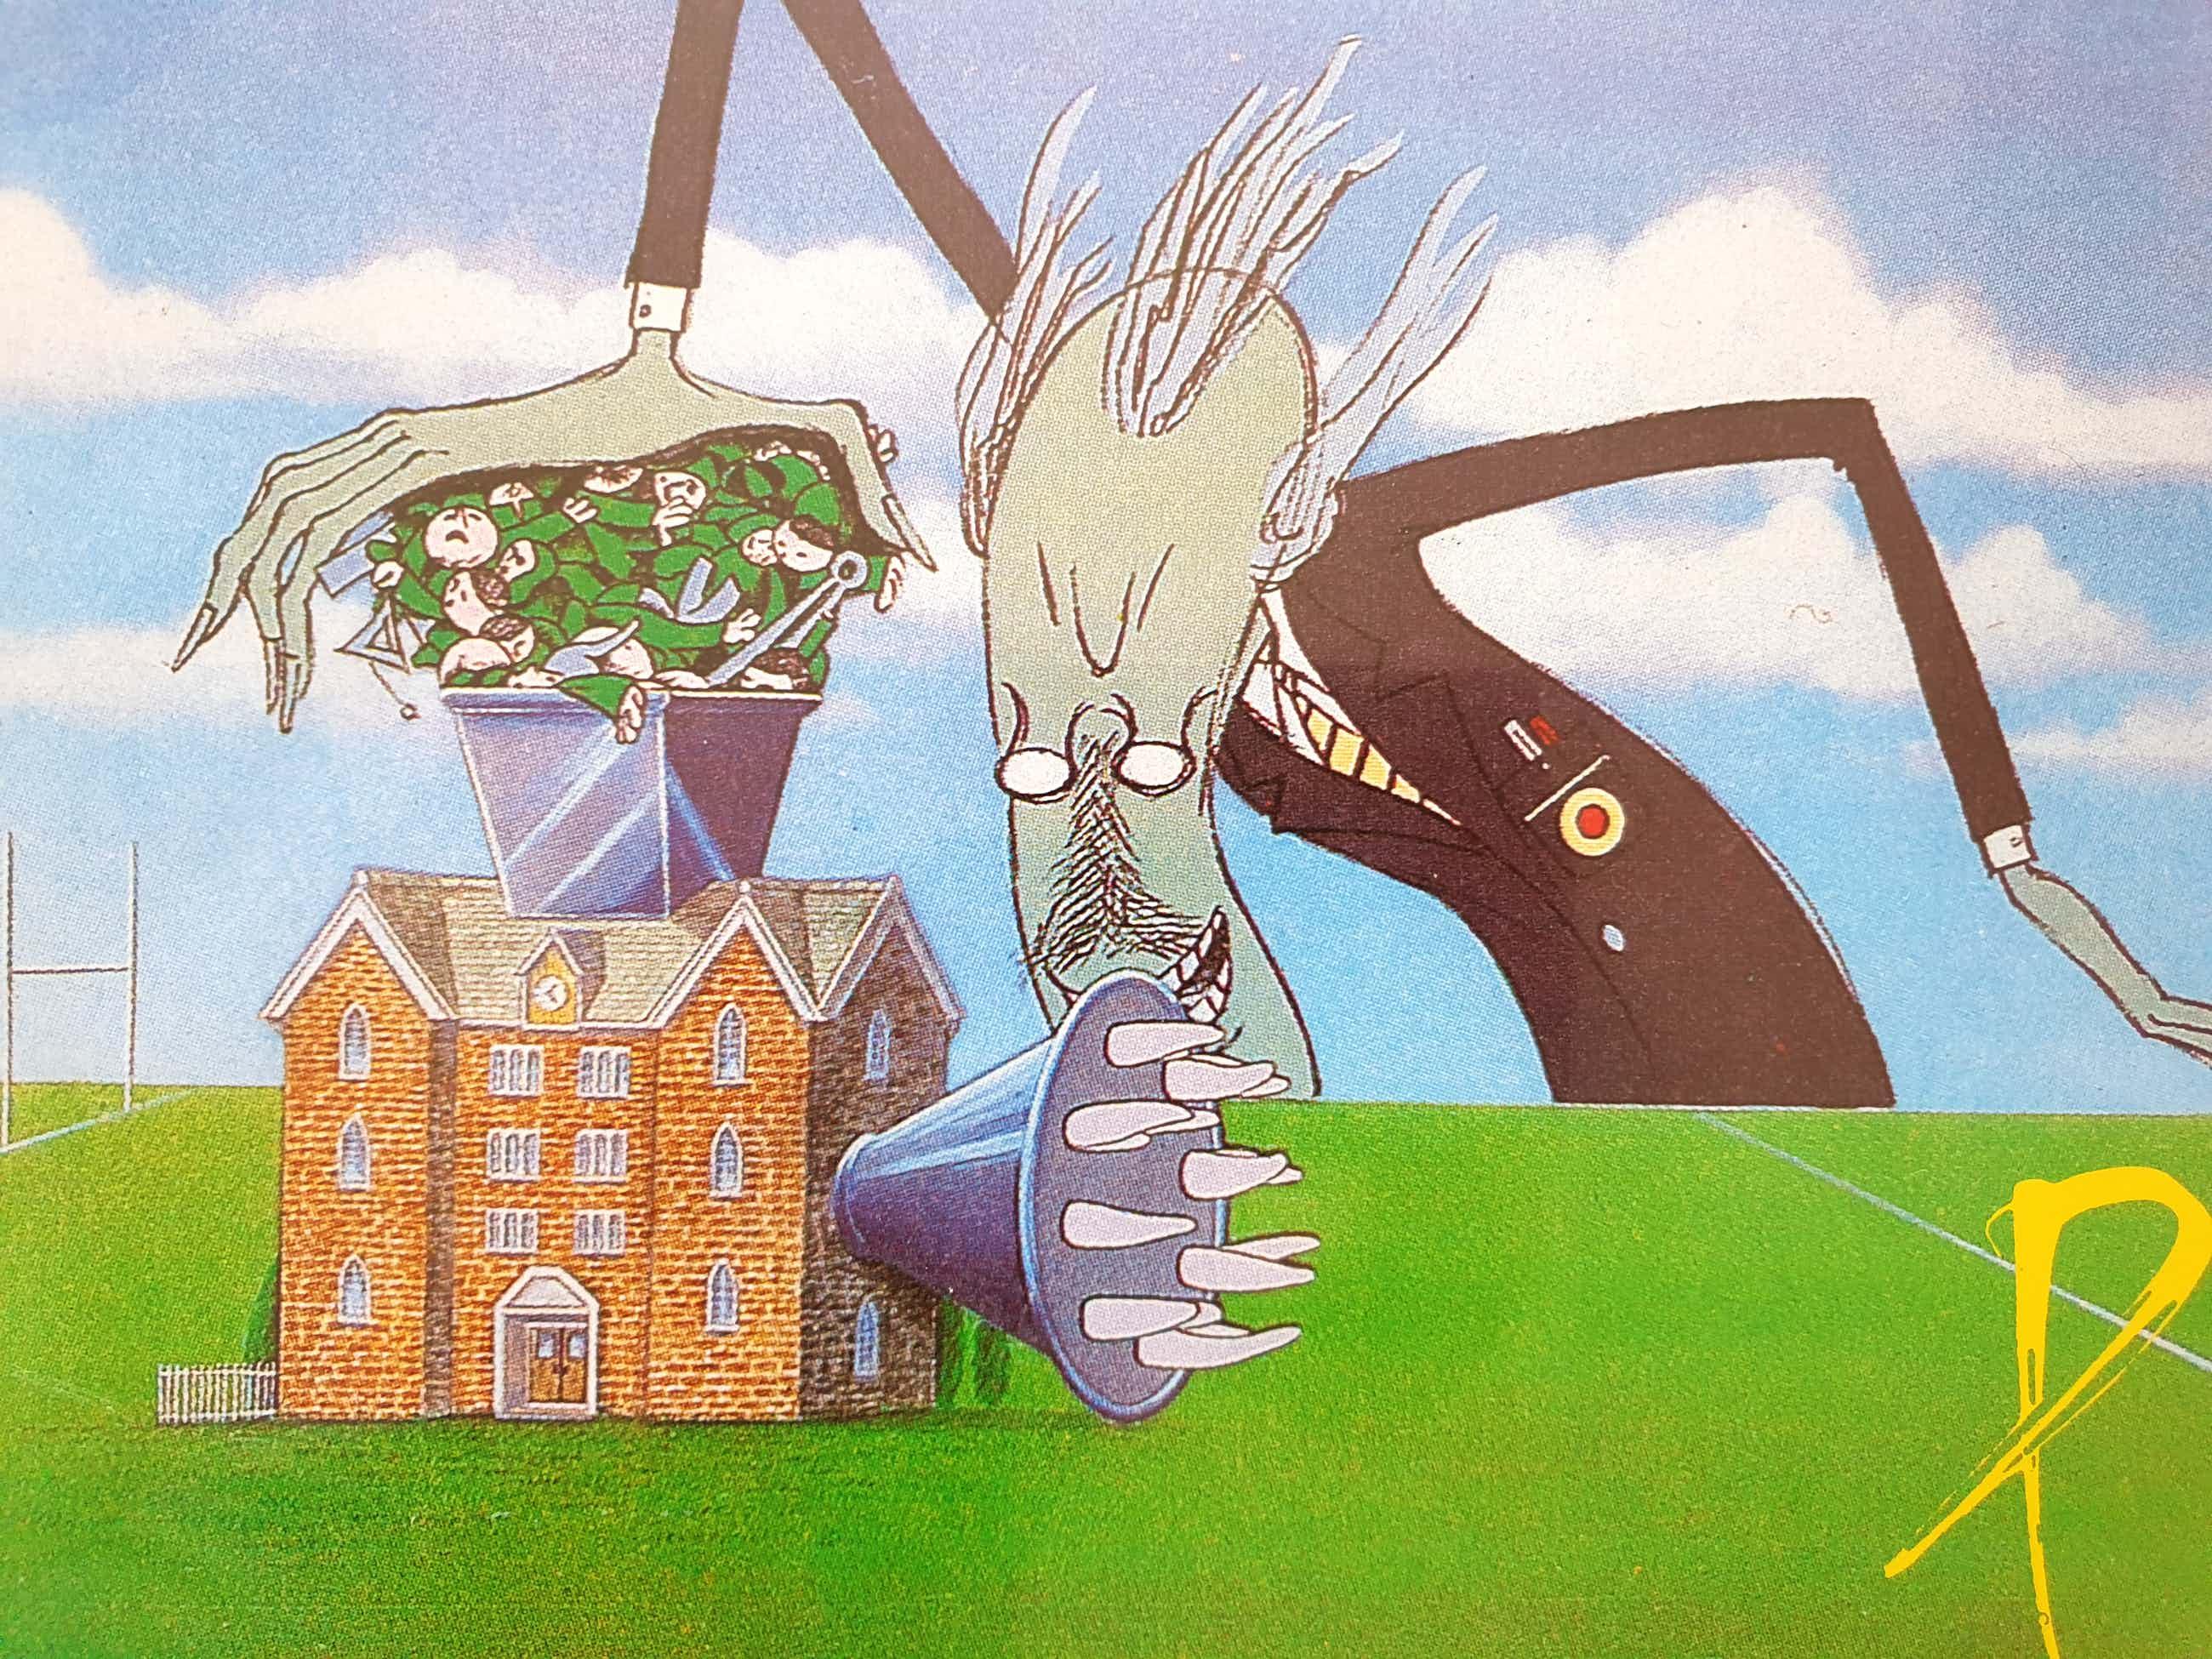 Pink Floyd - Poster 3x The Wall kopen? Bied vanaf 40!